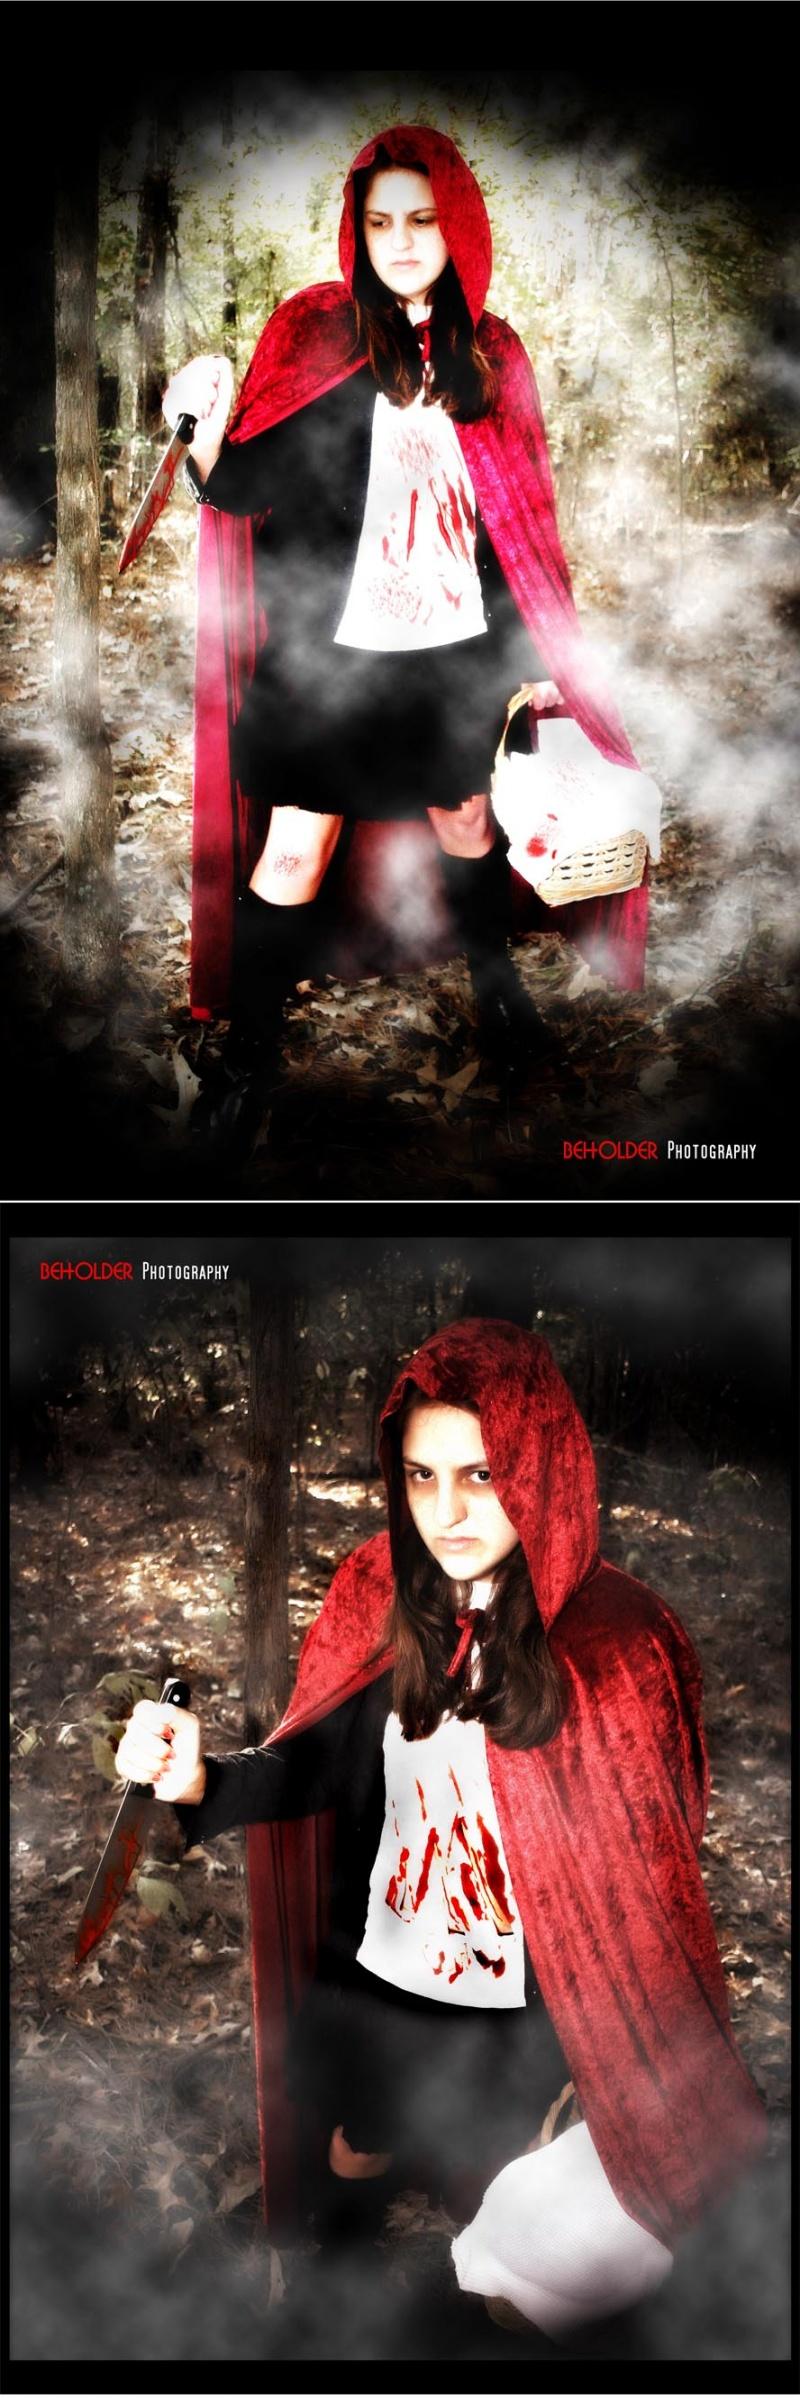 Nov 05, 2009 John W. Stout 2009 Dark Fairy Tales Series: Red Riding Hoods Revenge